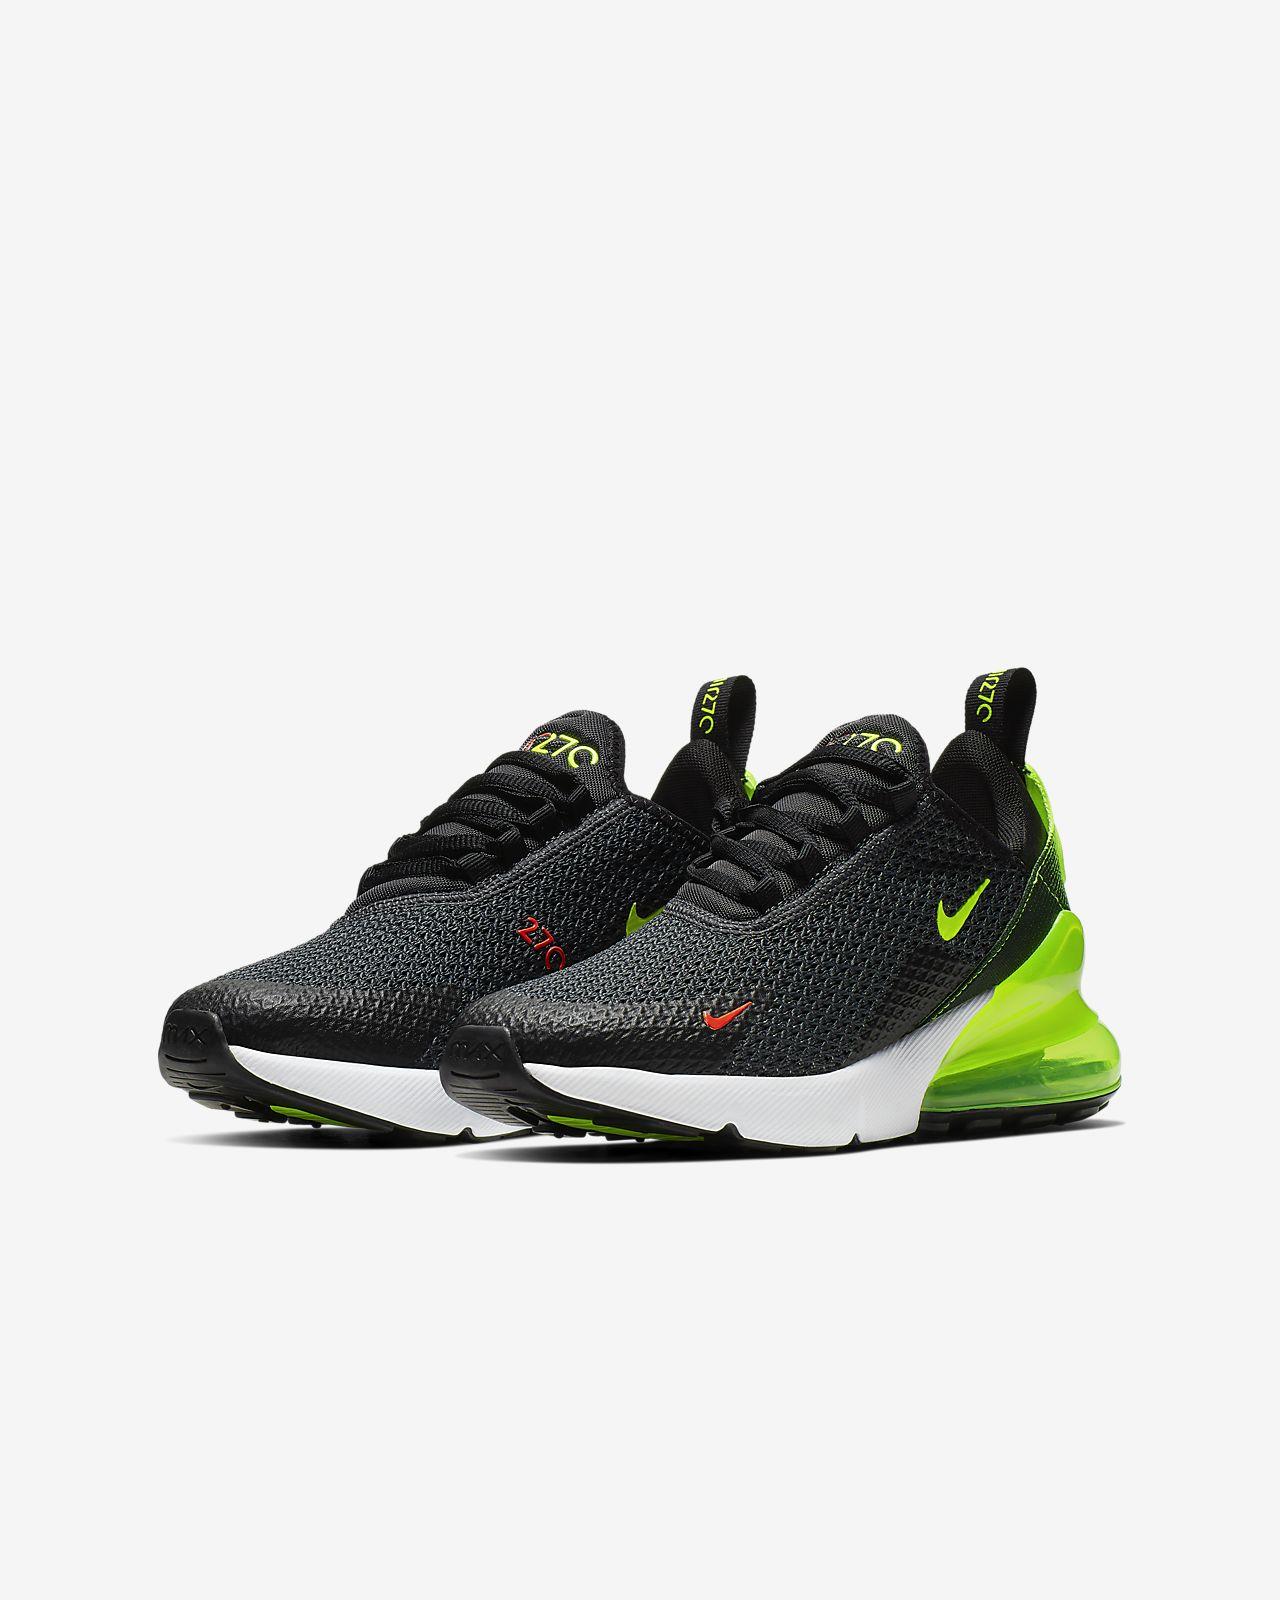 379f6efb673d Nike Air Max 270 Older Kids  Shoe. Nike.com GB